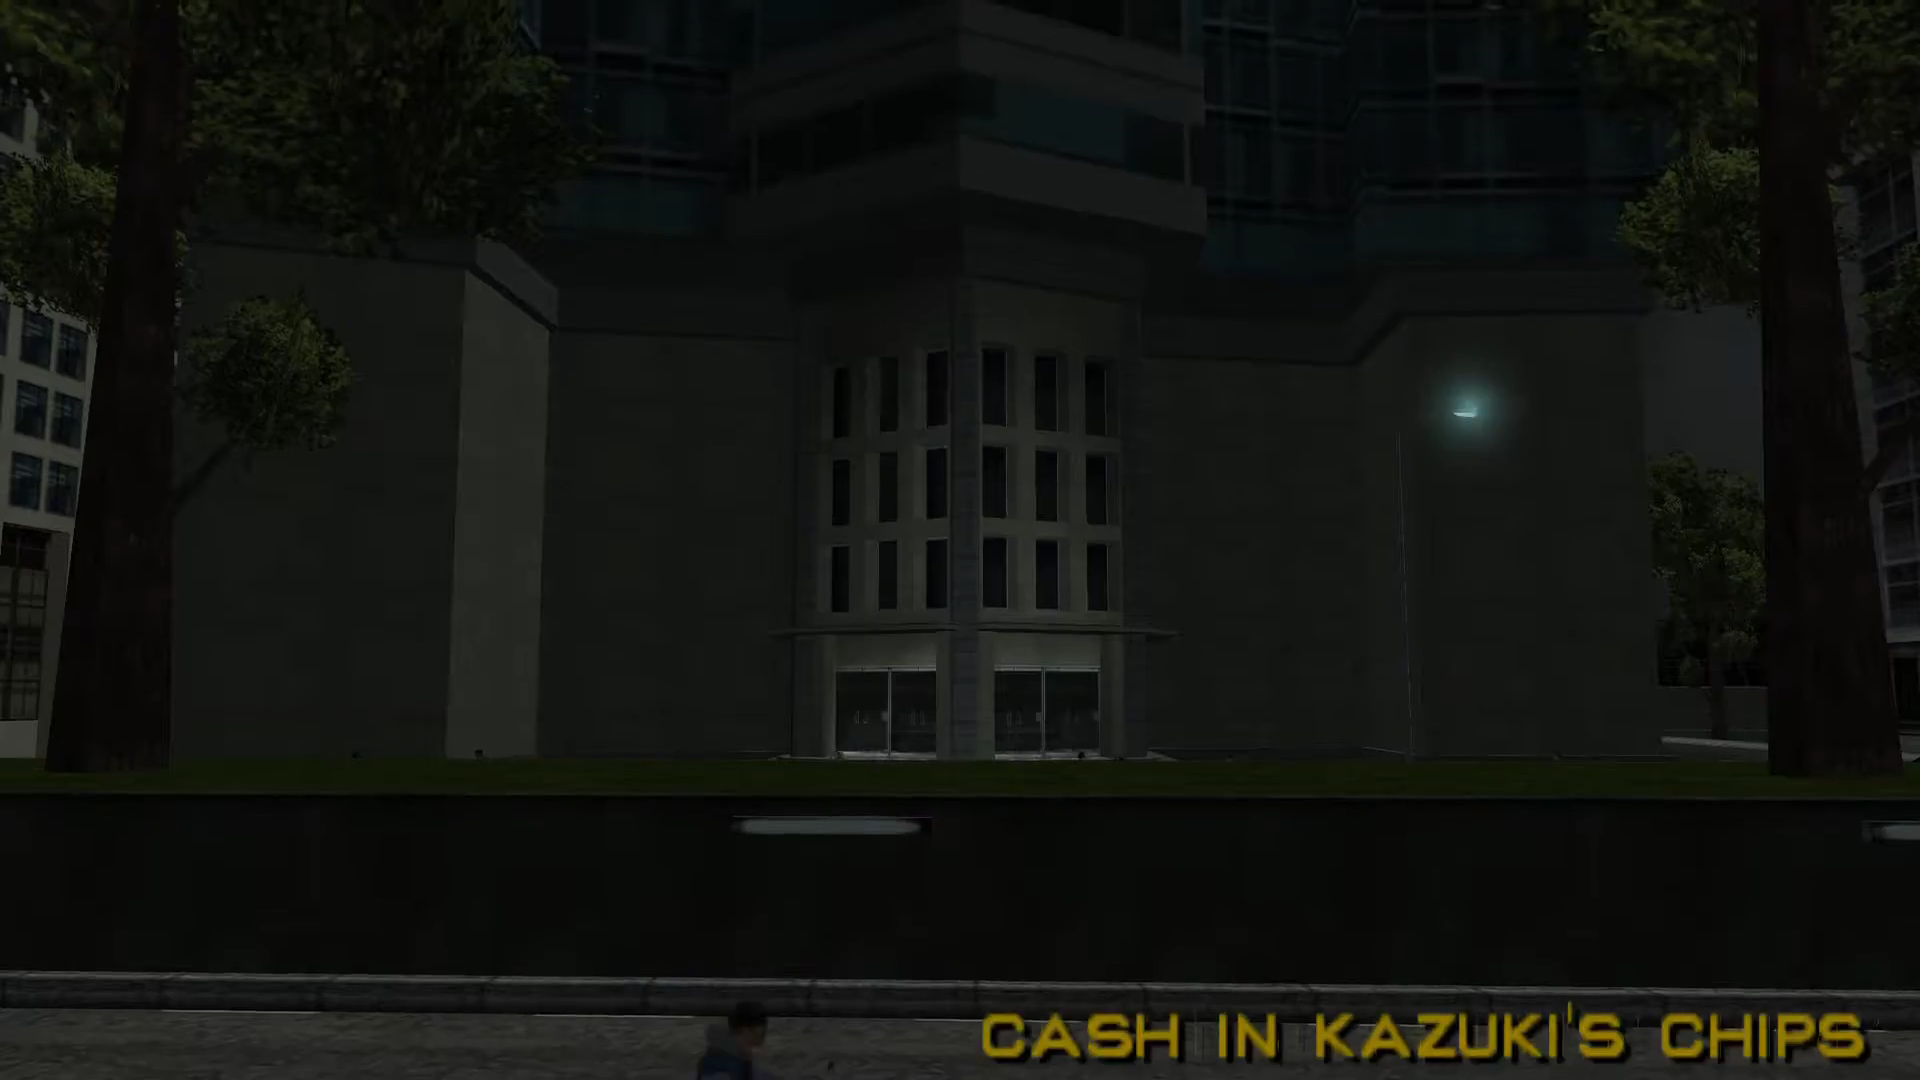 Cash in Kazuki's Chips